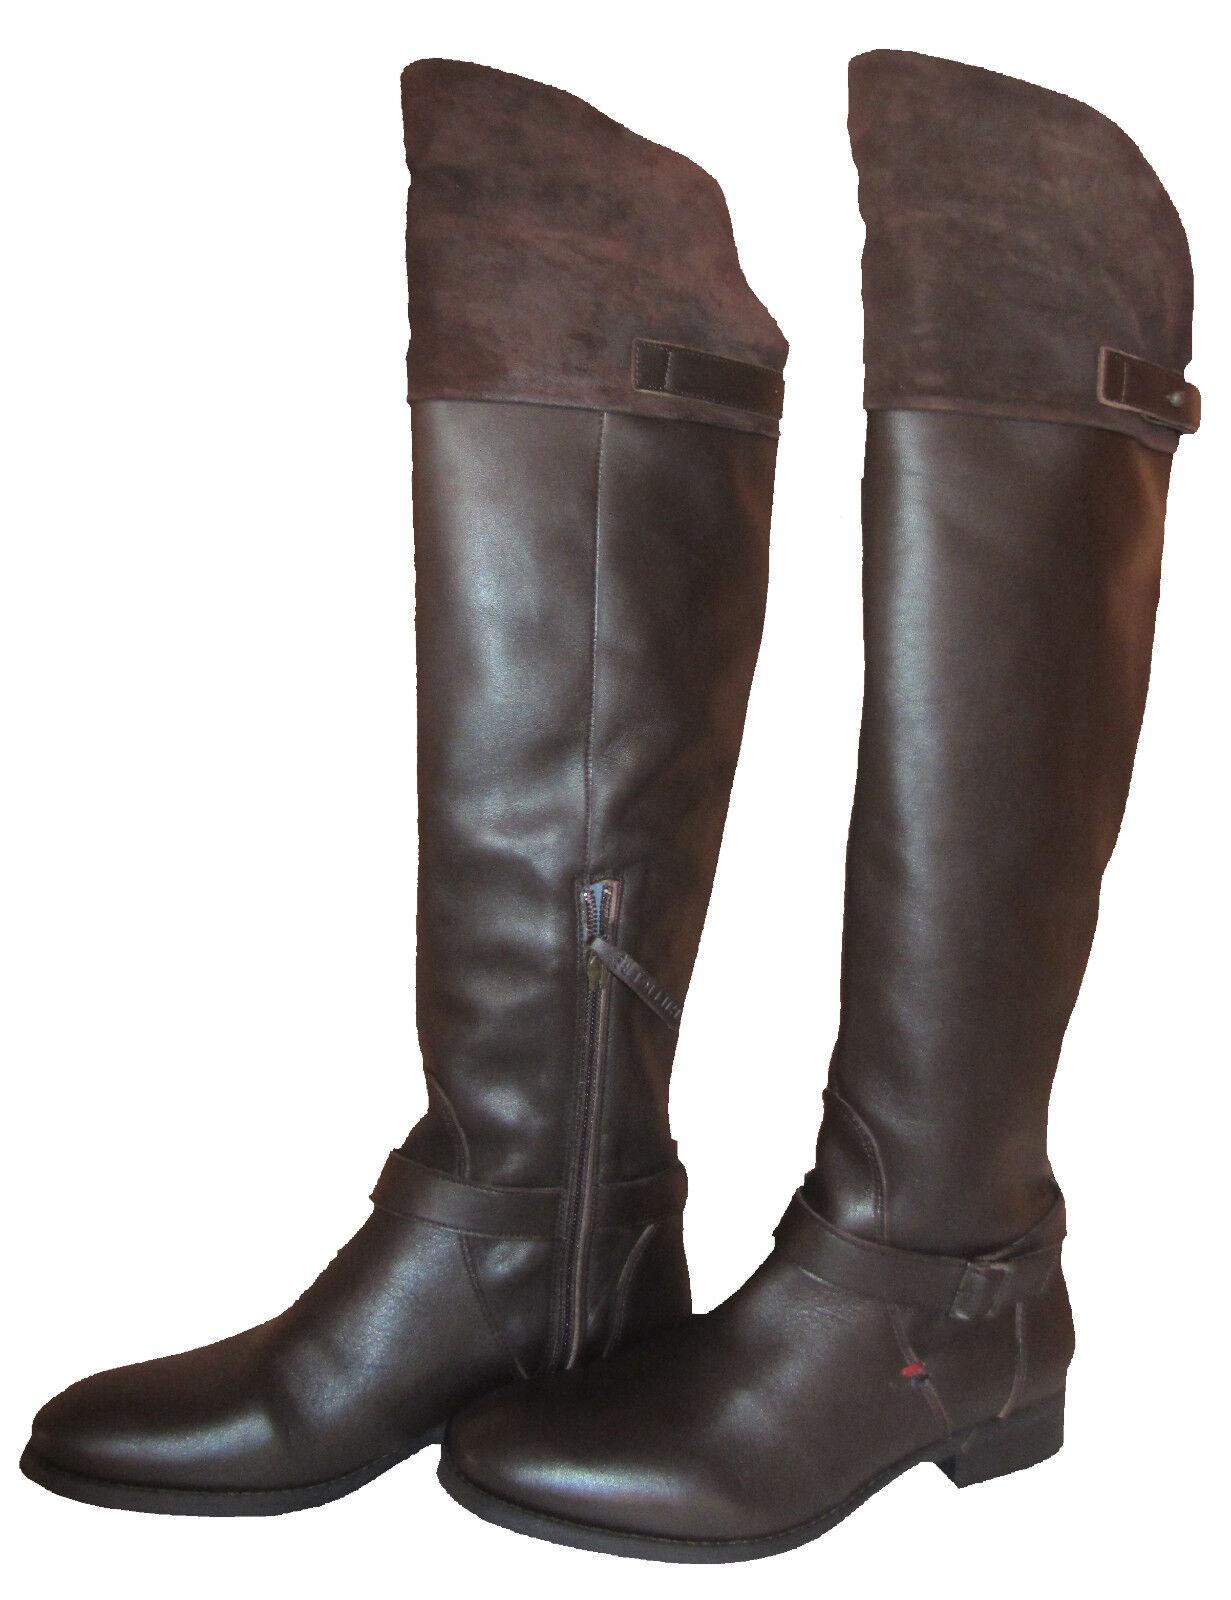 TOMMY HILFIGER HAMILTON 12 Stiefel C  DAMEN LEDER Stiefel 12 STIEFEL BRAUN NEU & OVP 8eb38d